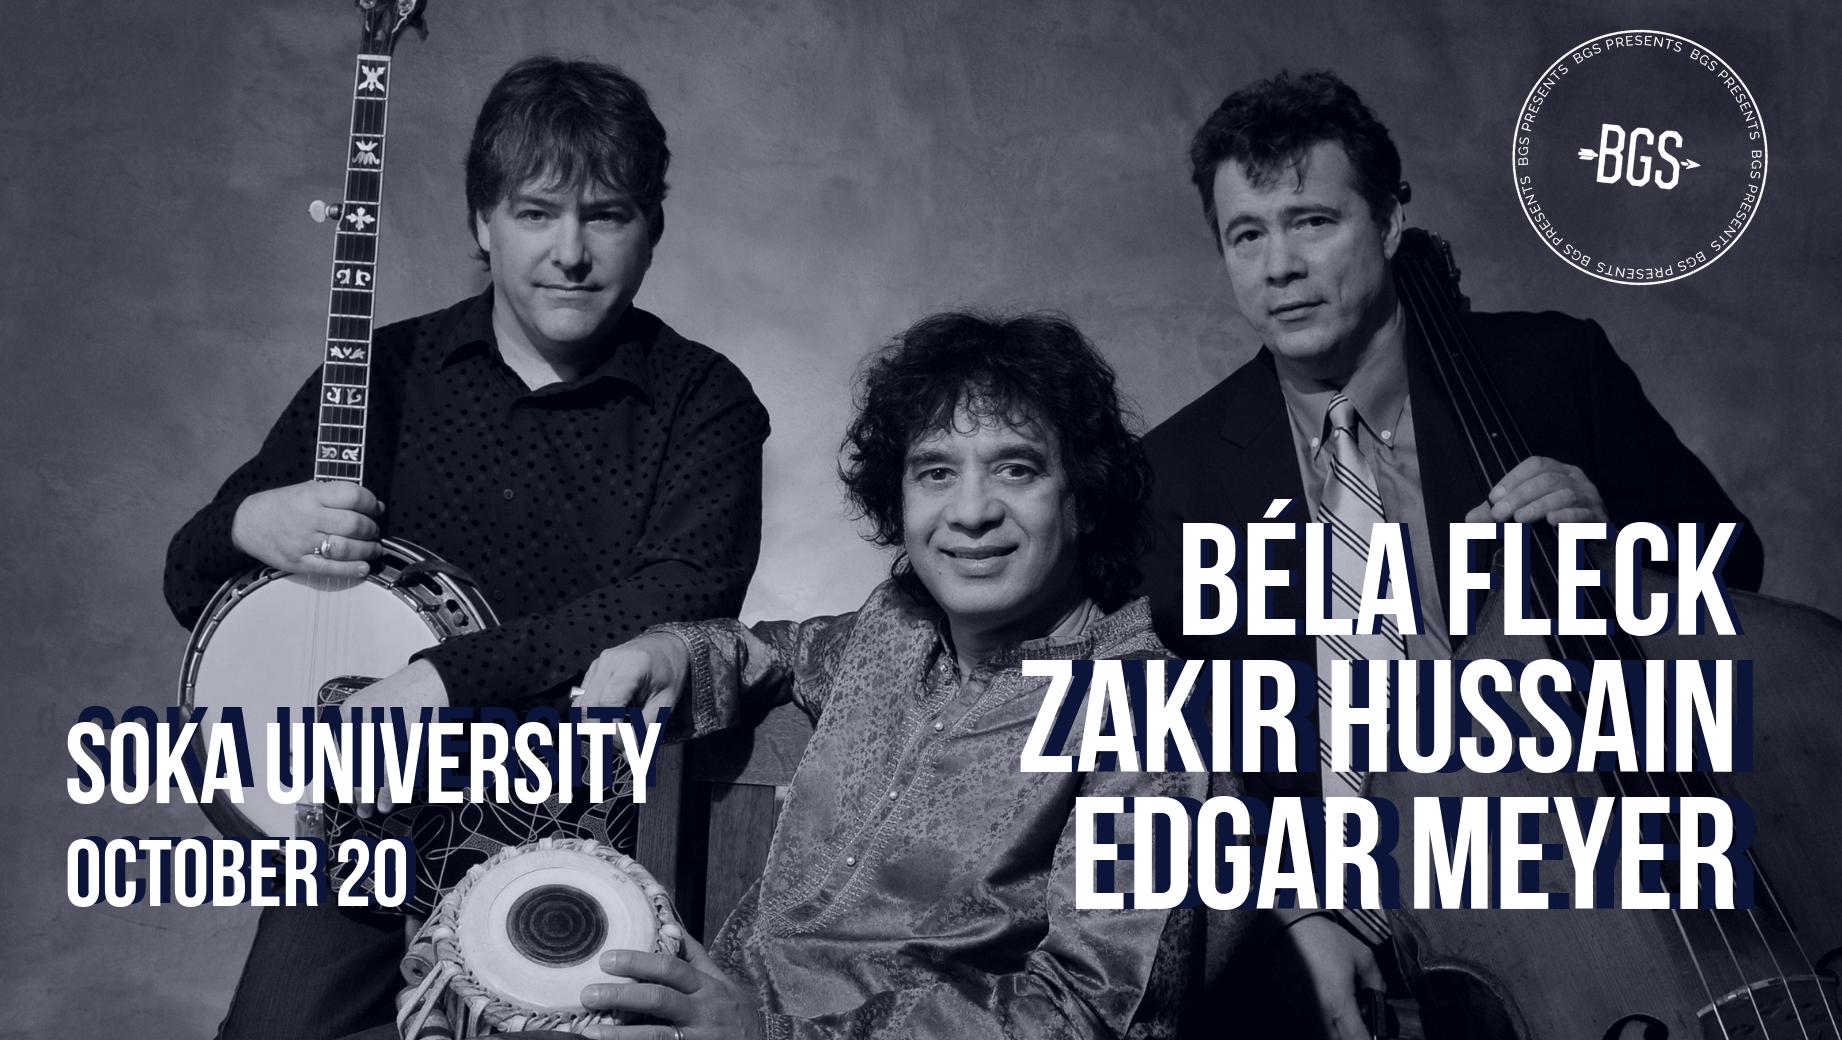 GIVEAWAY: Tickets to Béla Fleck, Zakir Hussain, and Edgar Meyer @ Soka University (Aliso Viejo, CA) 10/20